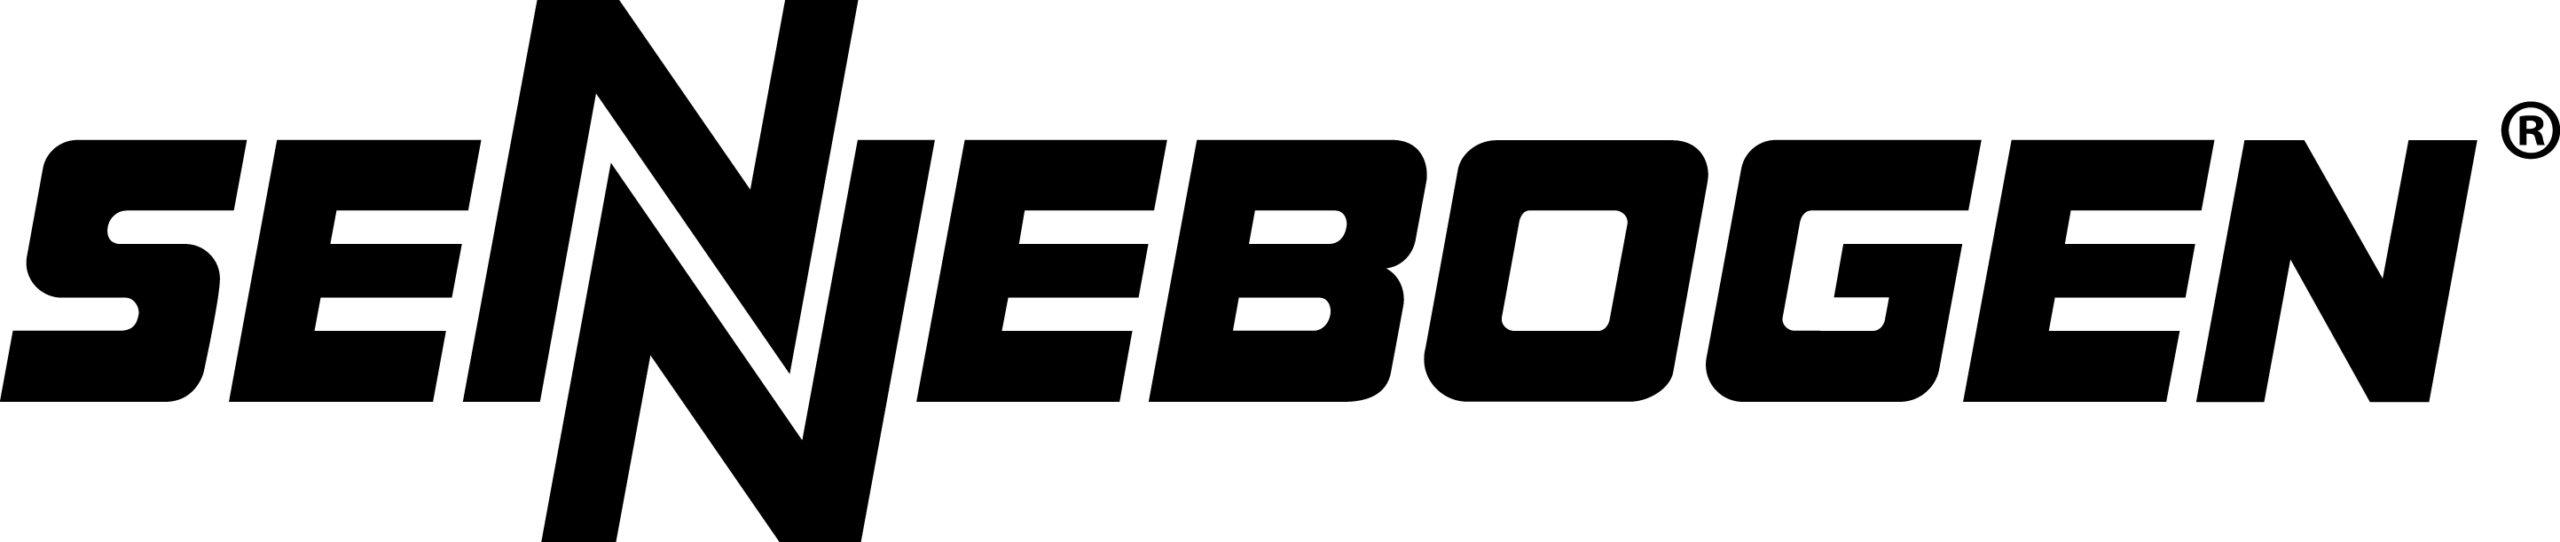 Sennebogen Logo schwarz_d